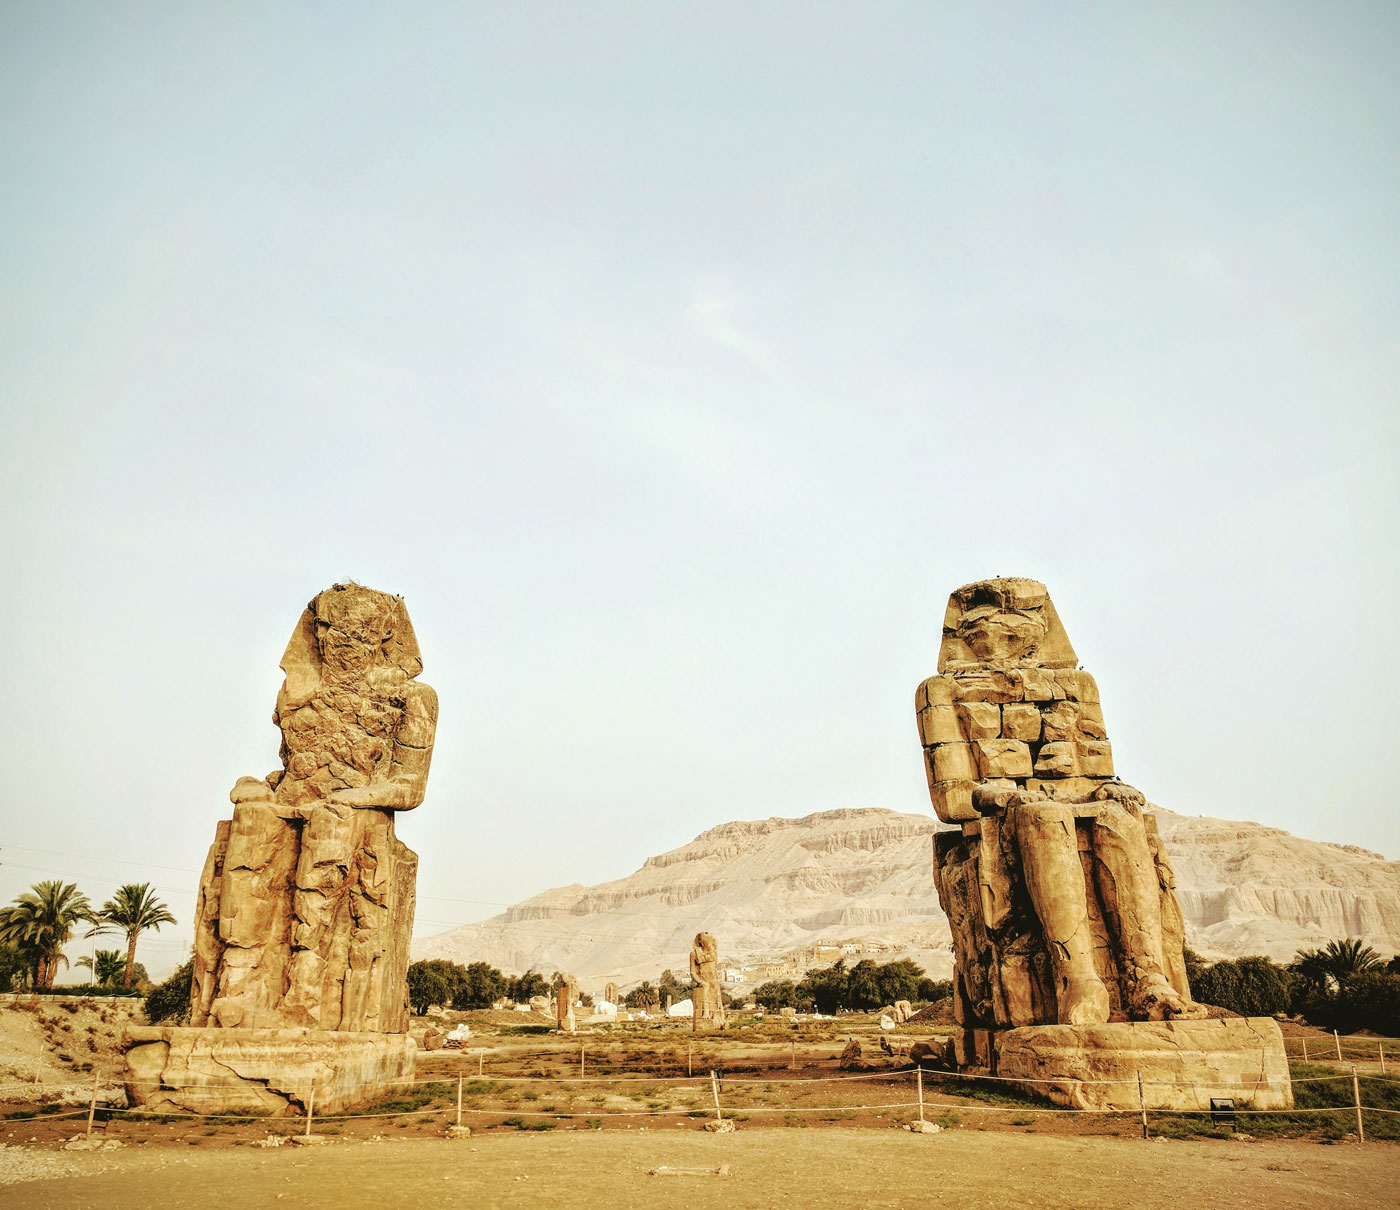 Colossi of Memnon statues at the Theban Necropolis near modern day Luxor